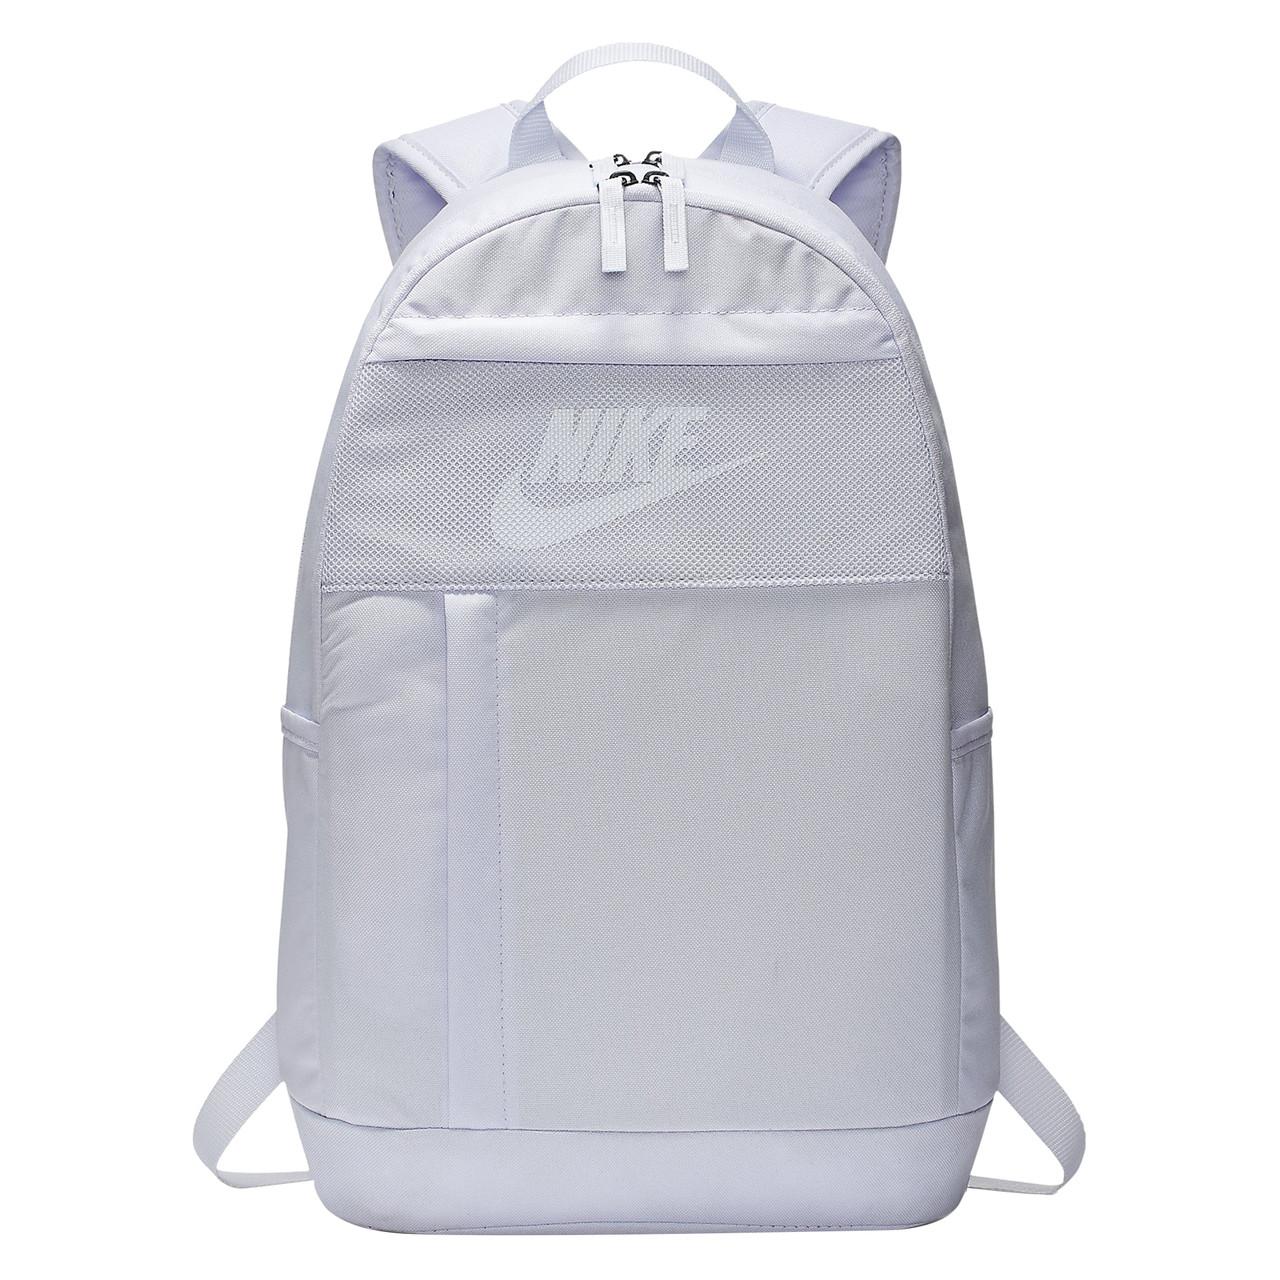 Рюкзак Nike Element 2.0 LBR BA5878-530 Фиолетовый (193145973329)